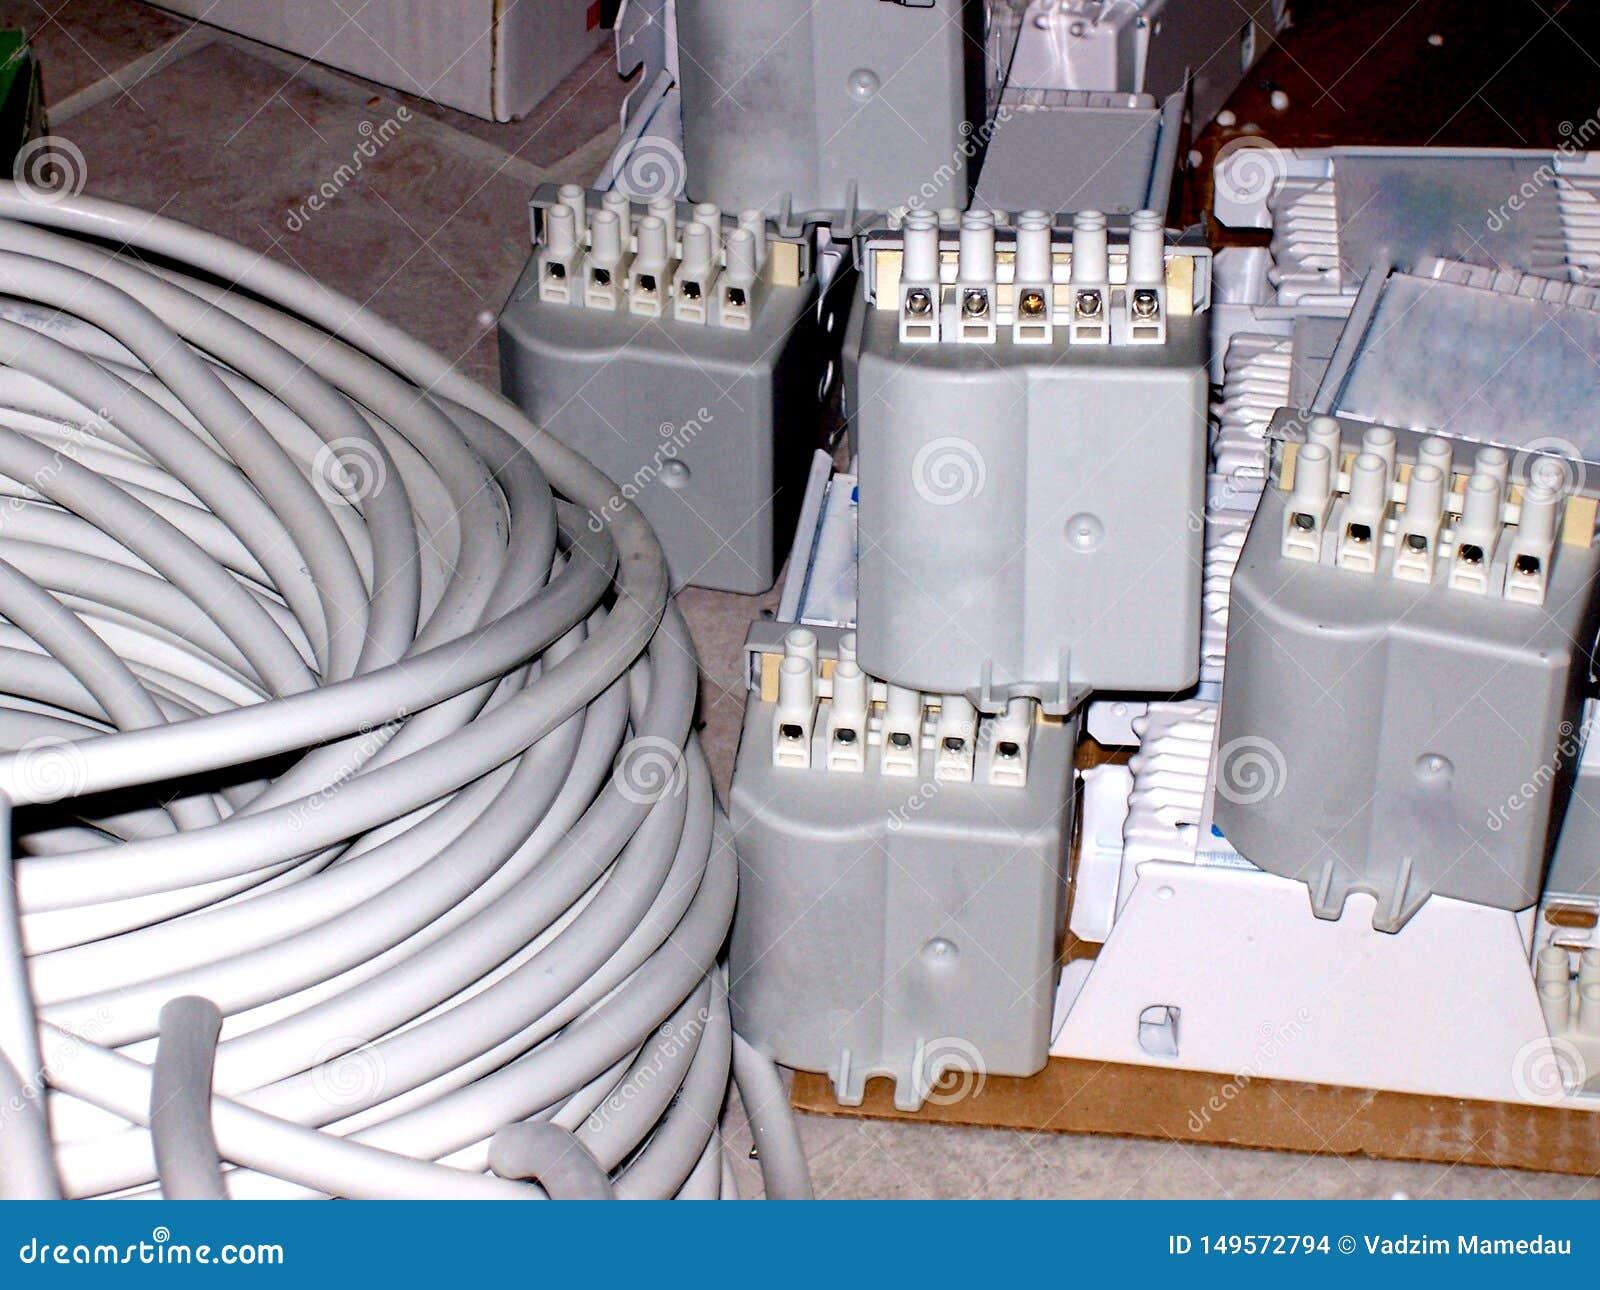 Electrical appliances automatons